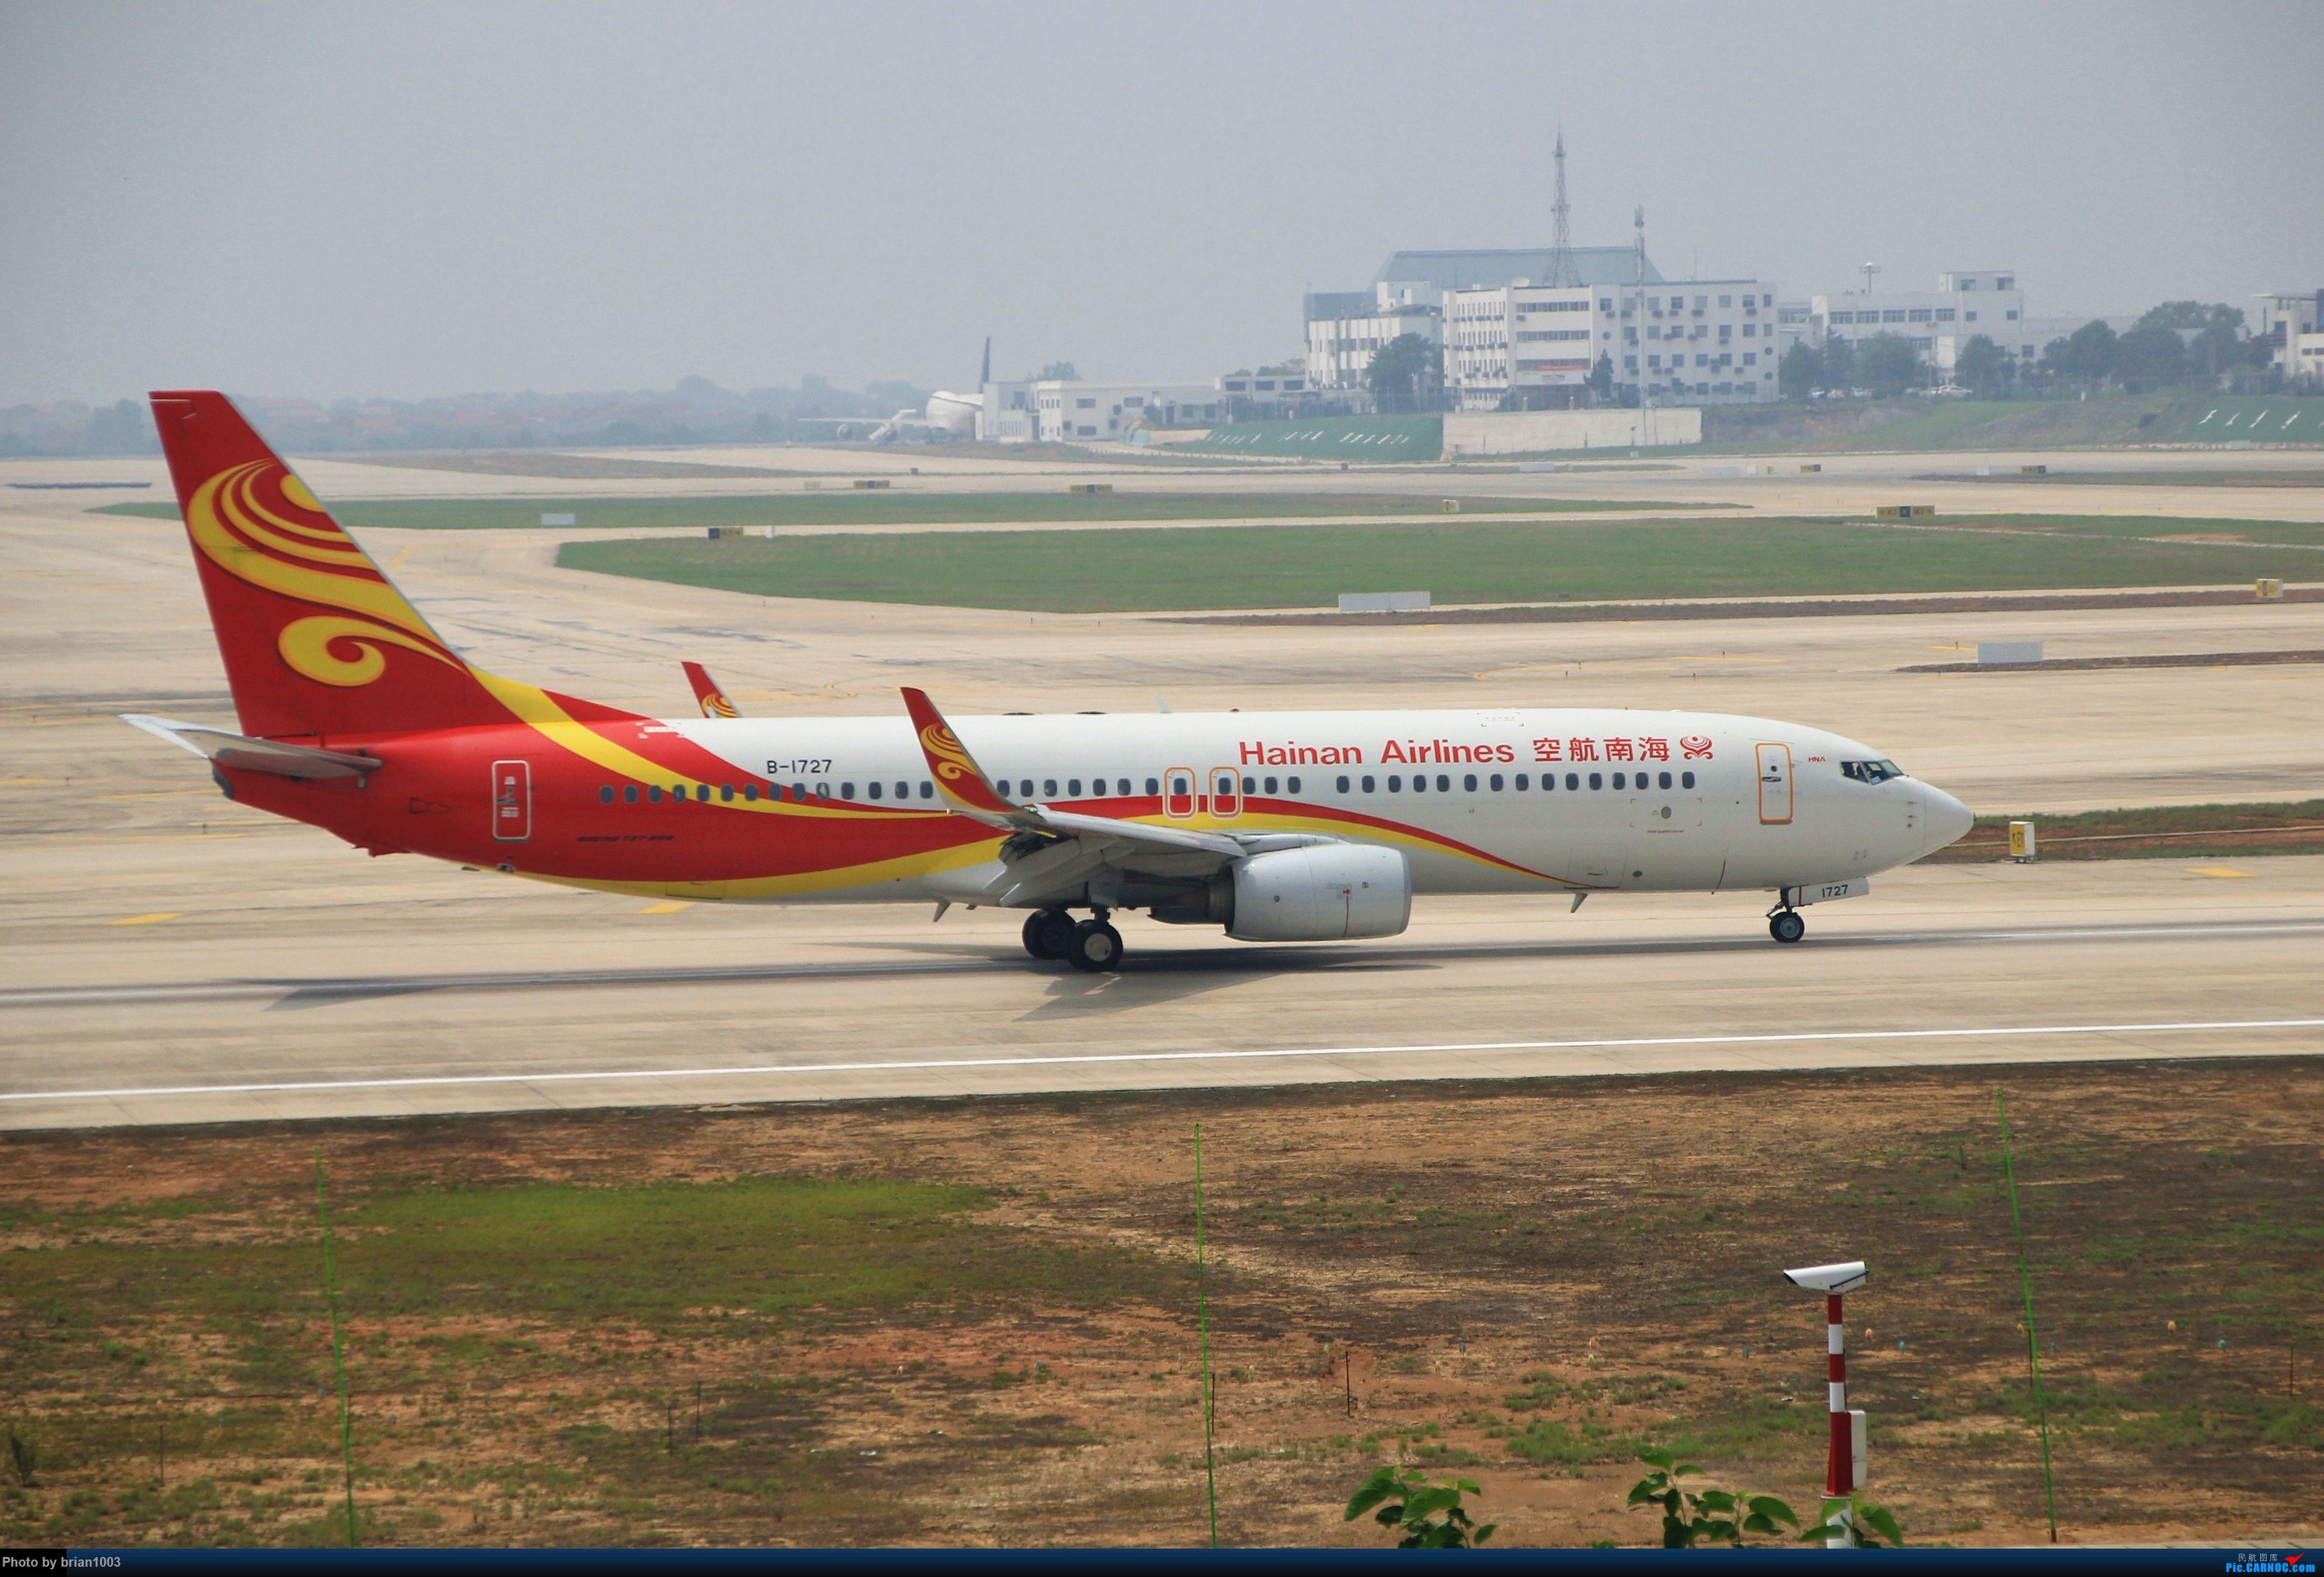 Re:[原创]WUH武汉天河机场拍机之二跑最后忙碌时 BOEING 737-800 B-1727 中国武汉天河国际机场